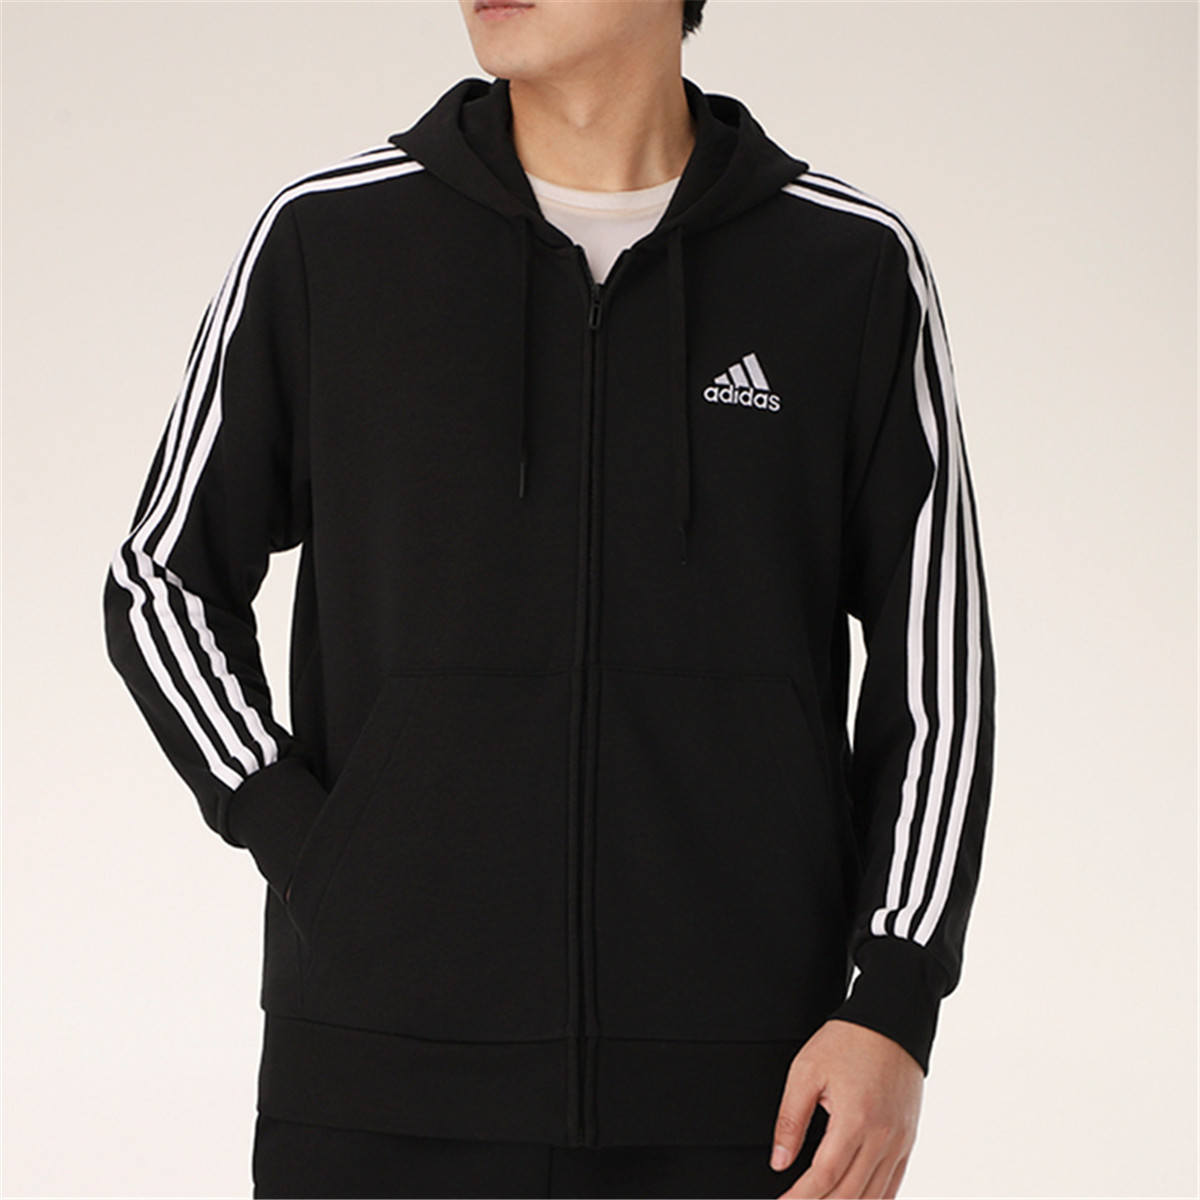 adidas 阿迪达斯 男式外套男款针织休闲运动夹克外套运动服男装